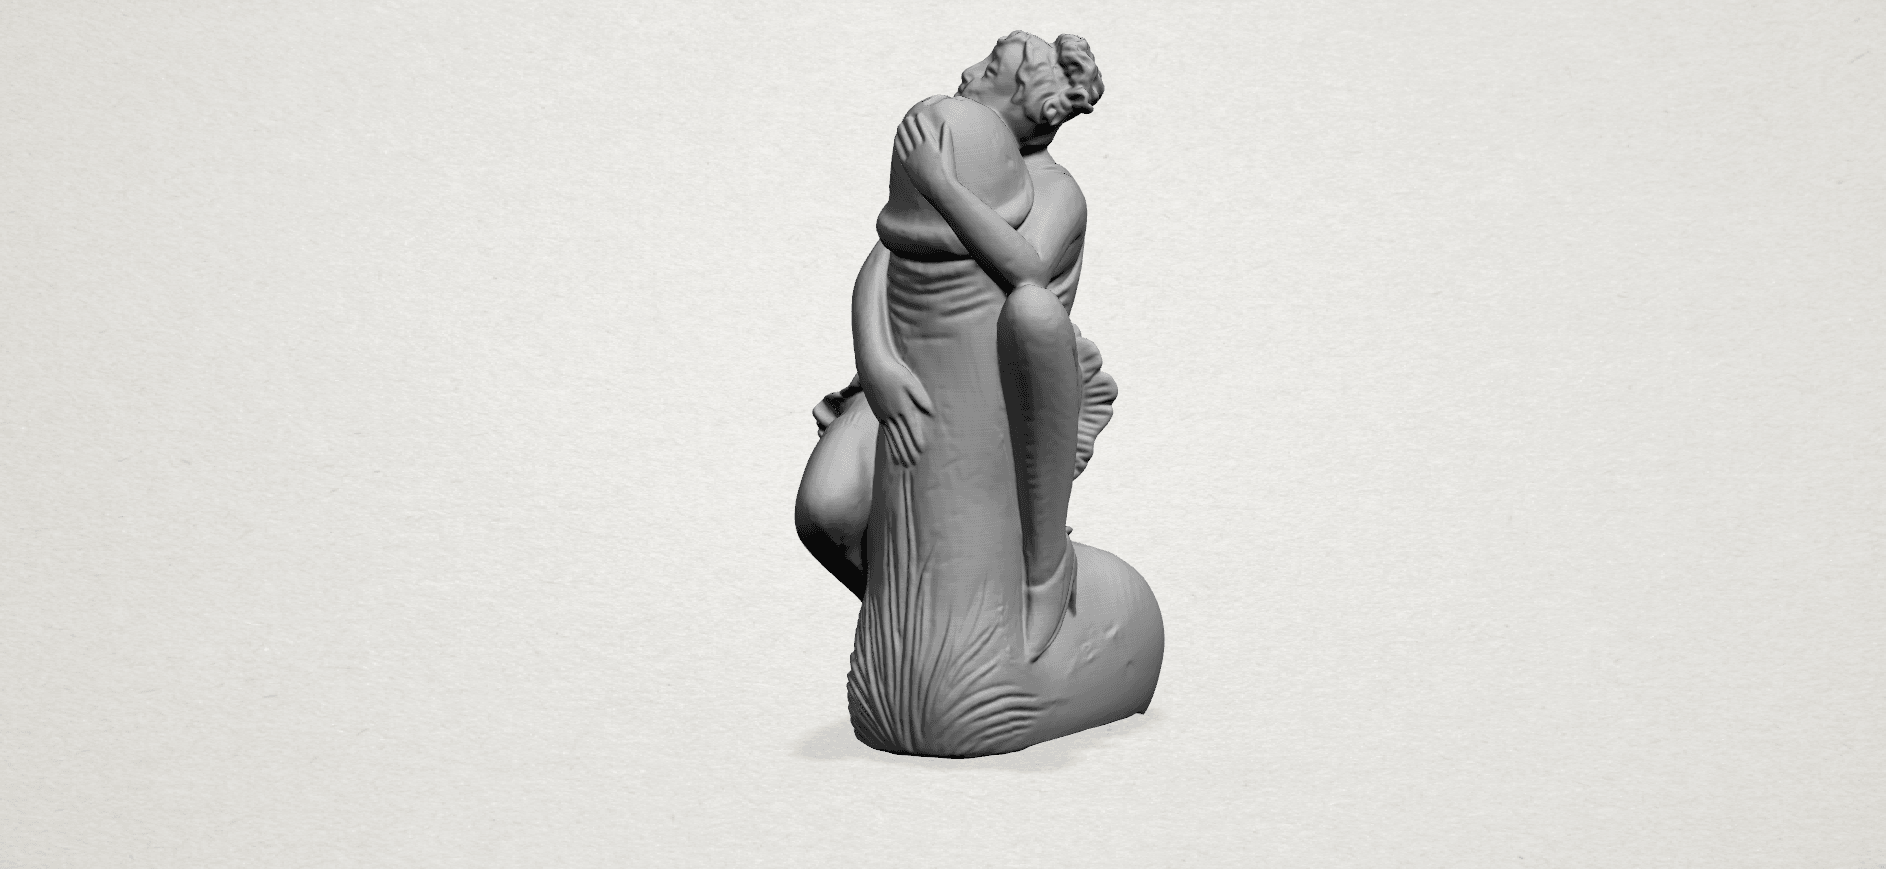 Alice hugging Dick - A02.png Download free STL file Alice hugging Dick • 3D printer design, GeorgesNikkei